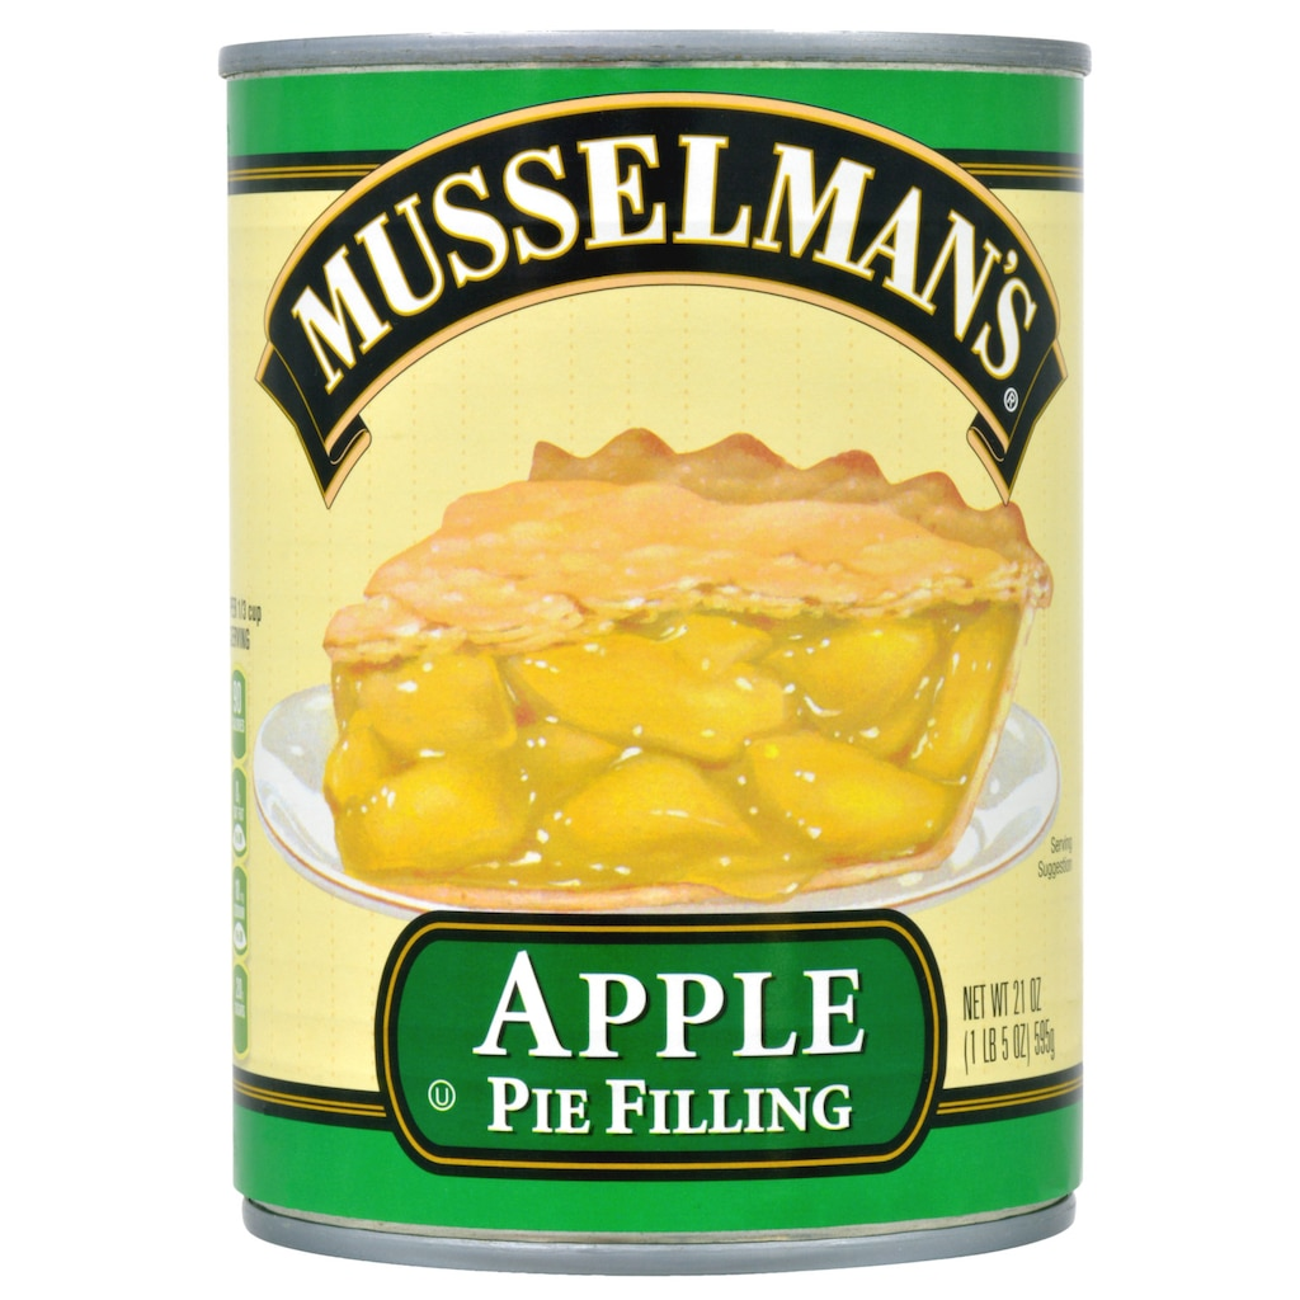 Musselman's Apple Pie Filling, 21-oz. Cans